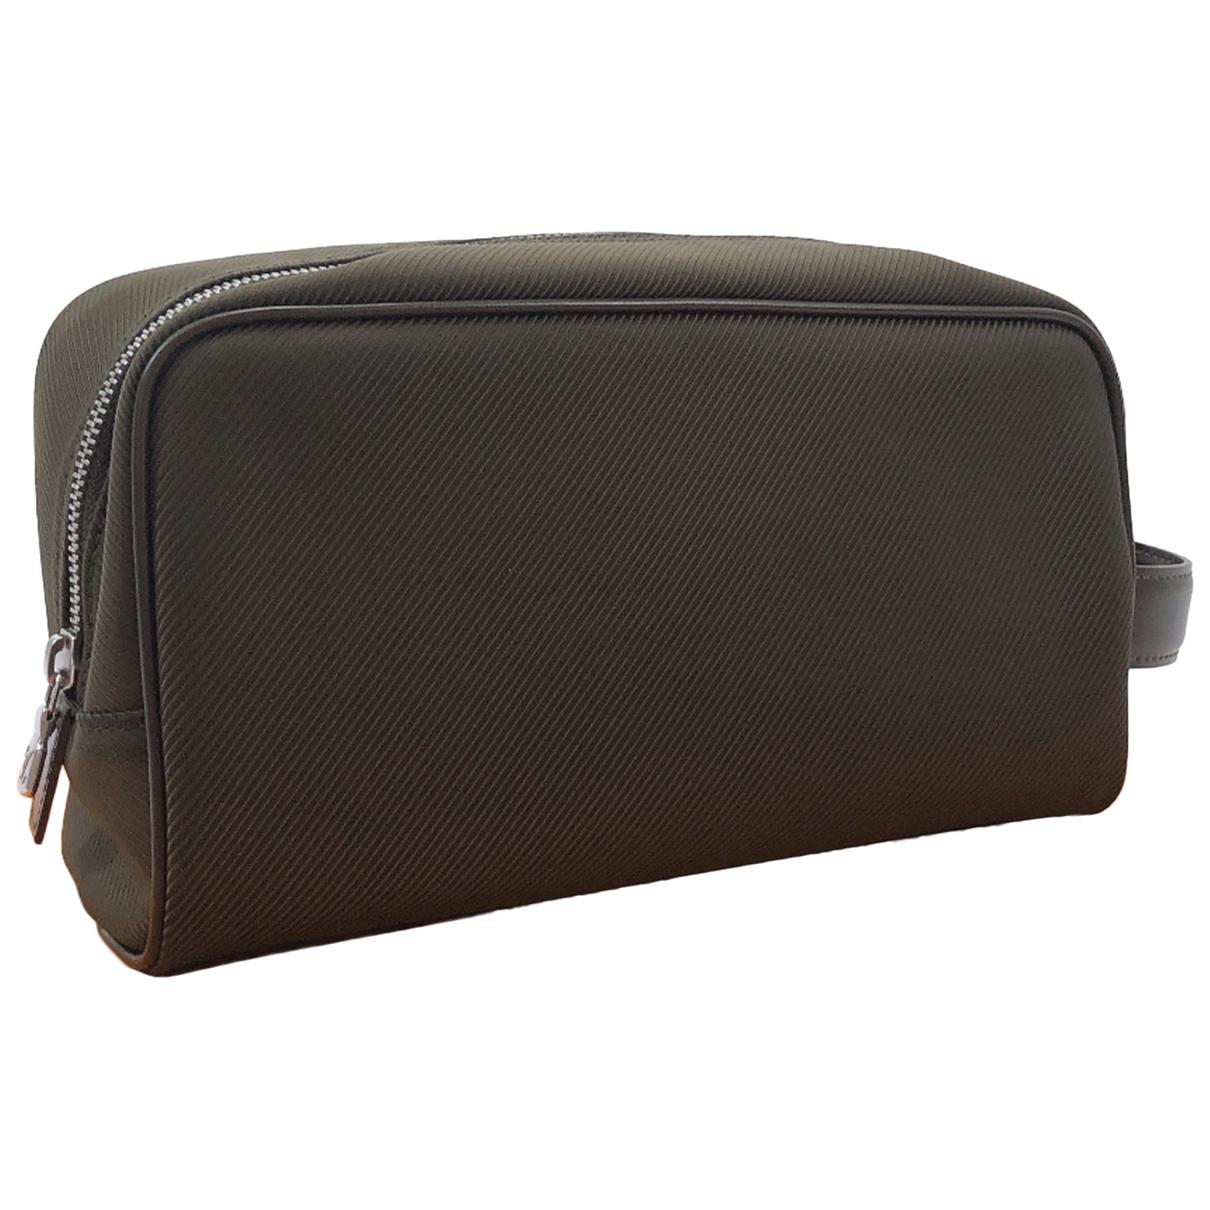 Louis Vuitton N Khaki Leather bag for Men N